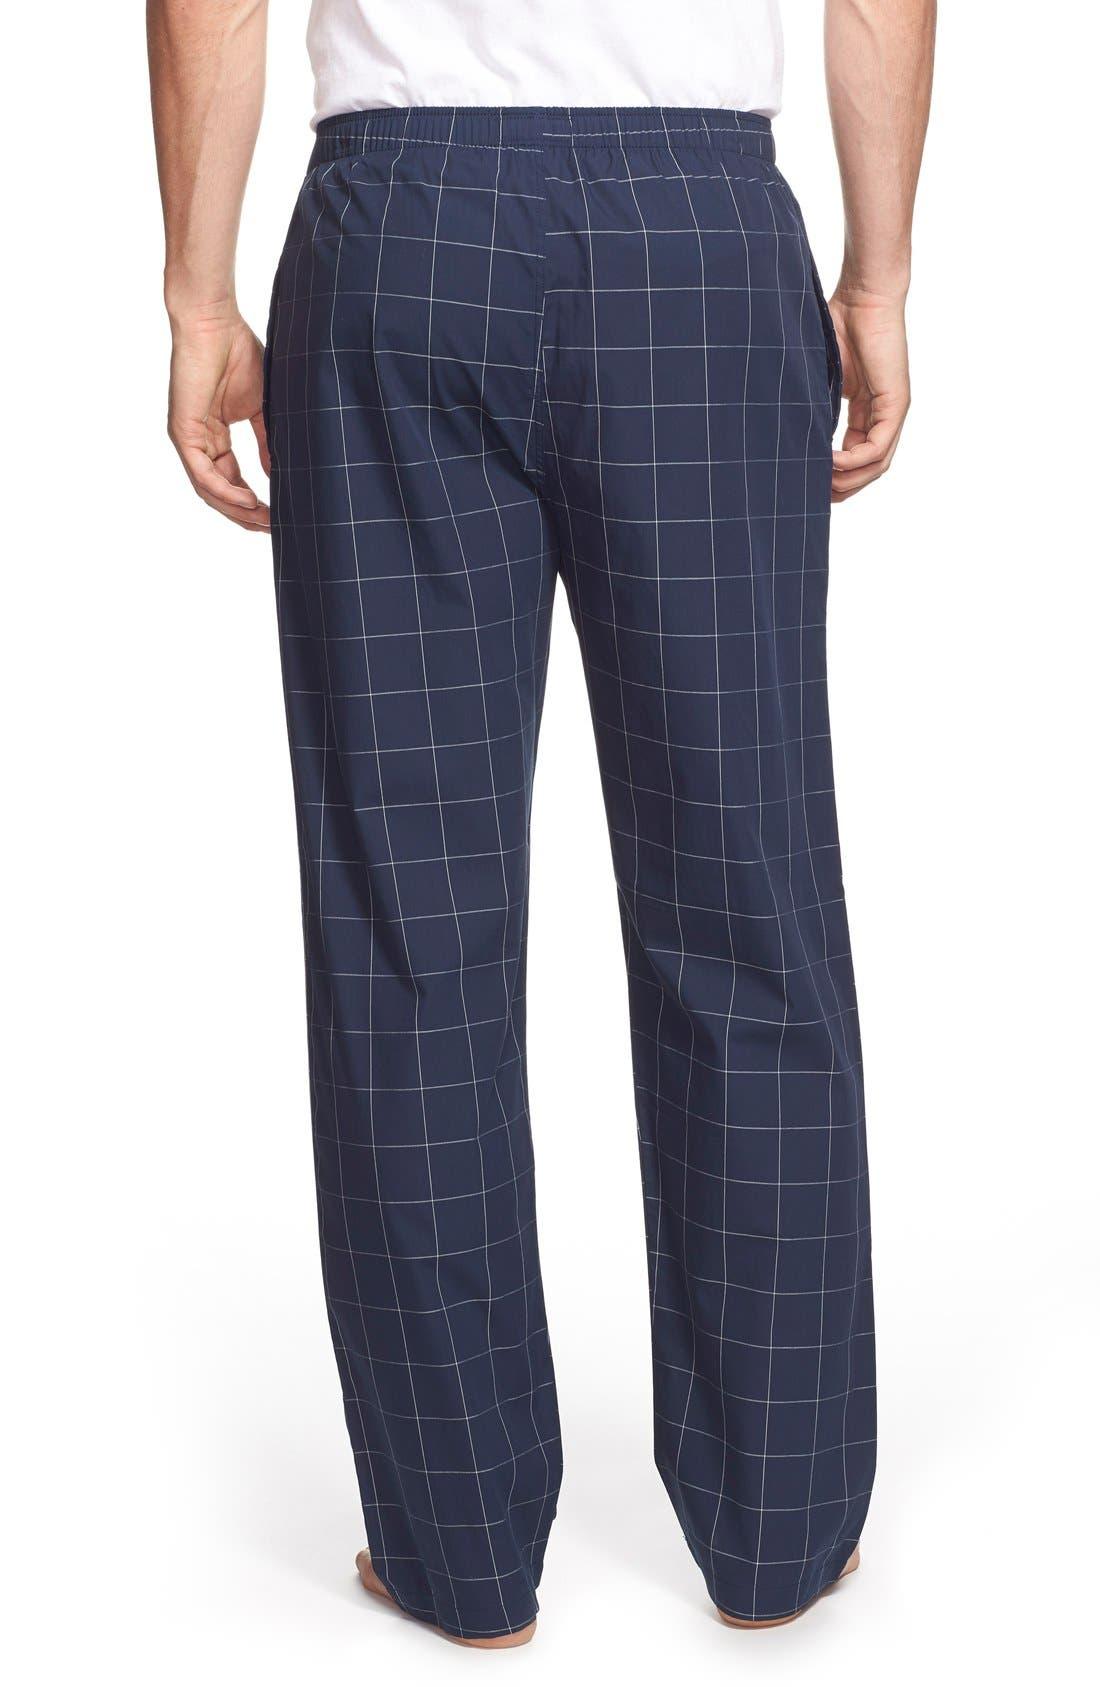 Cotton Pajama Pants,                             Alternate thumbnail 2, color,                             Cruise Navy